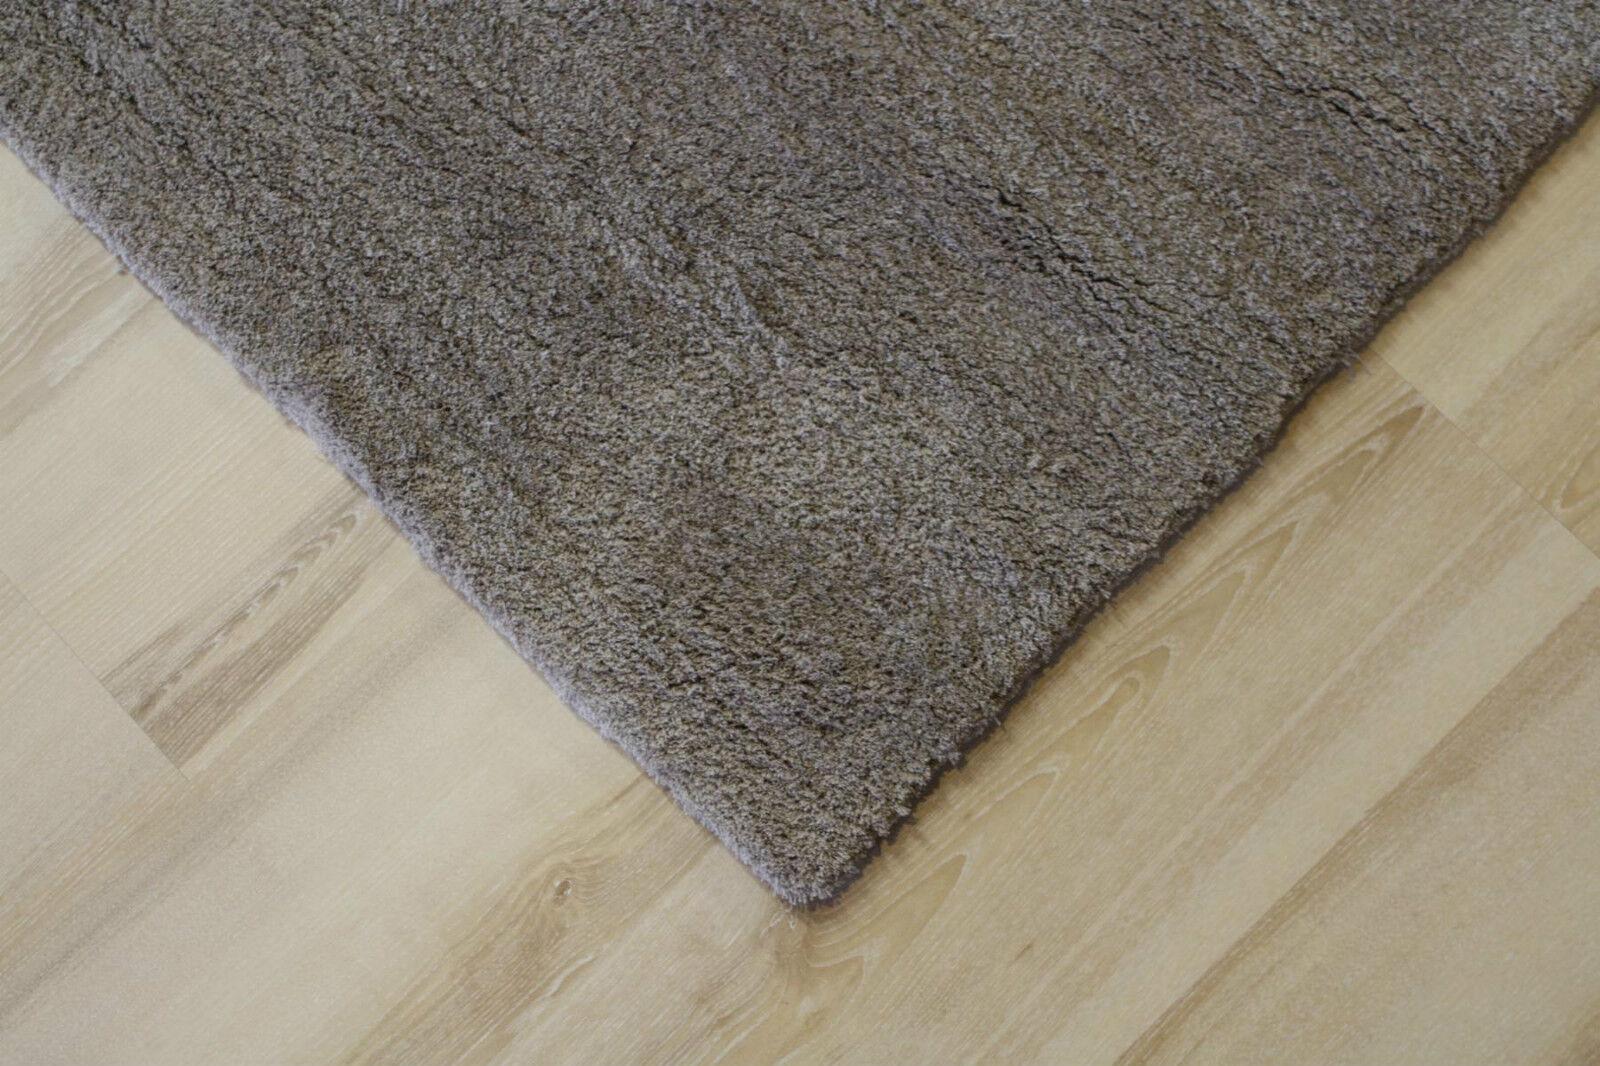 Teppich Langflor Astra Livorno 005 grau 70x140 cm weich